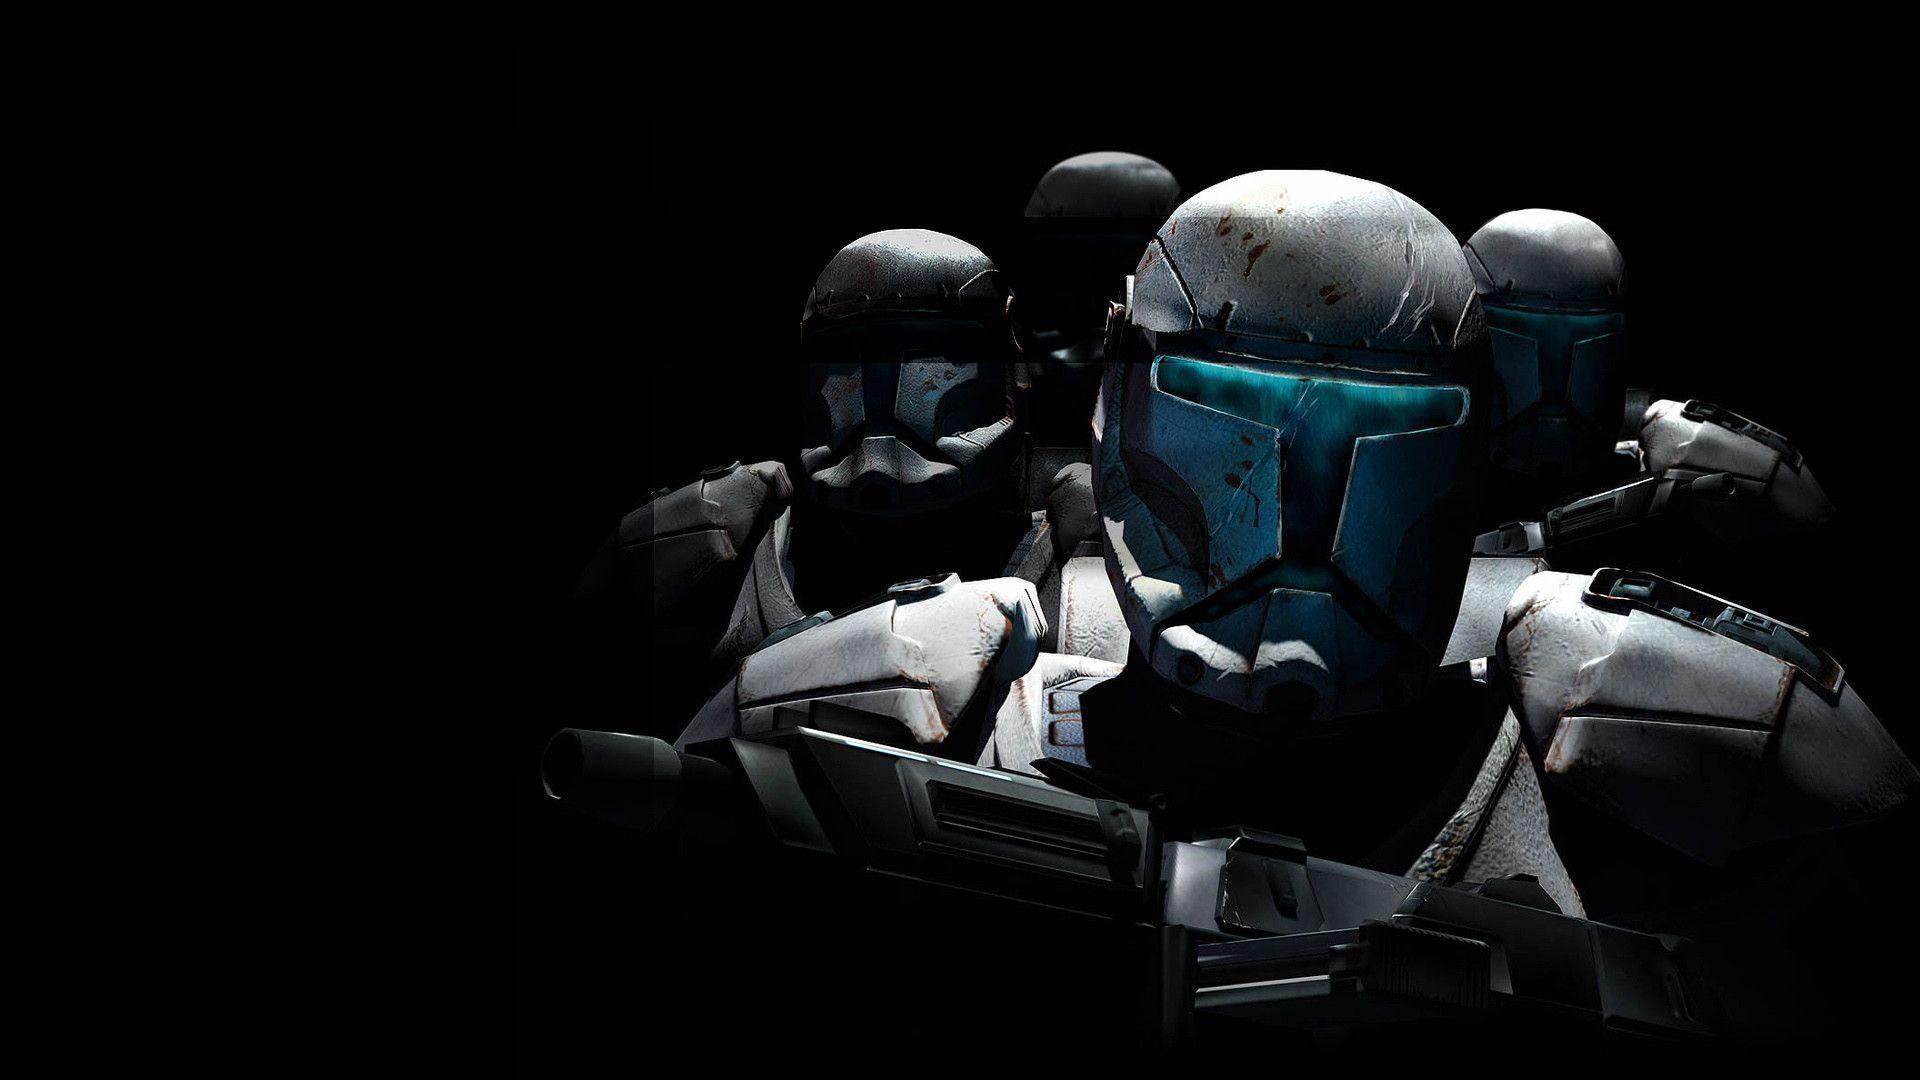 501St Clone Trooper Wallpaper 64 images 1920x1080